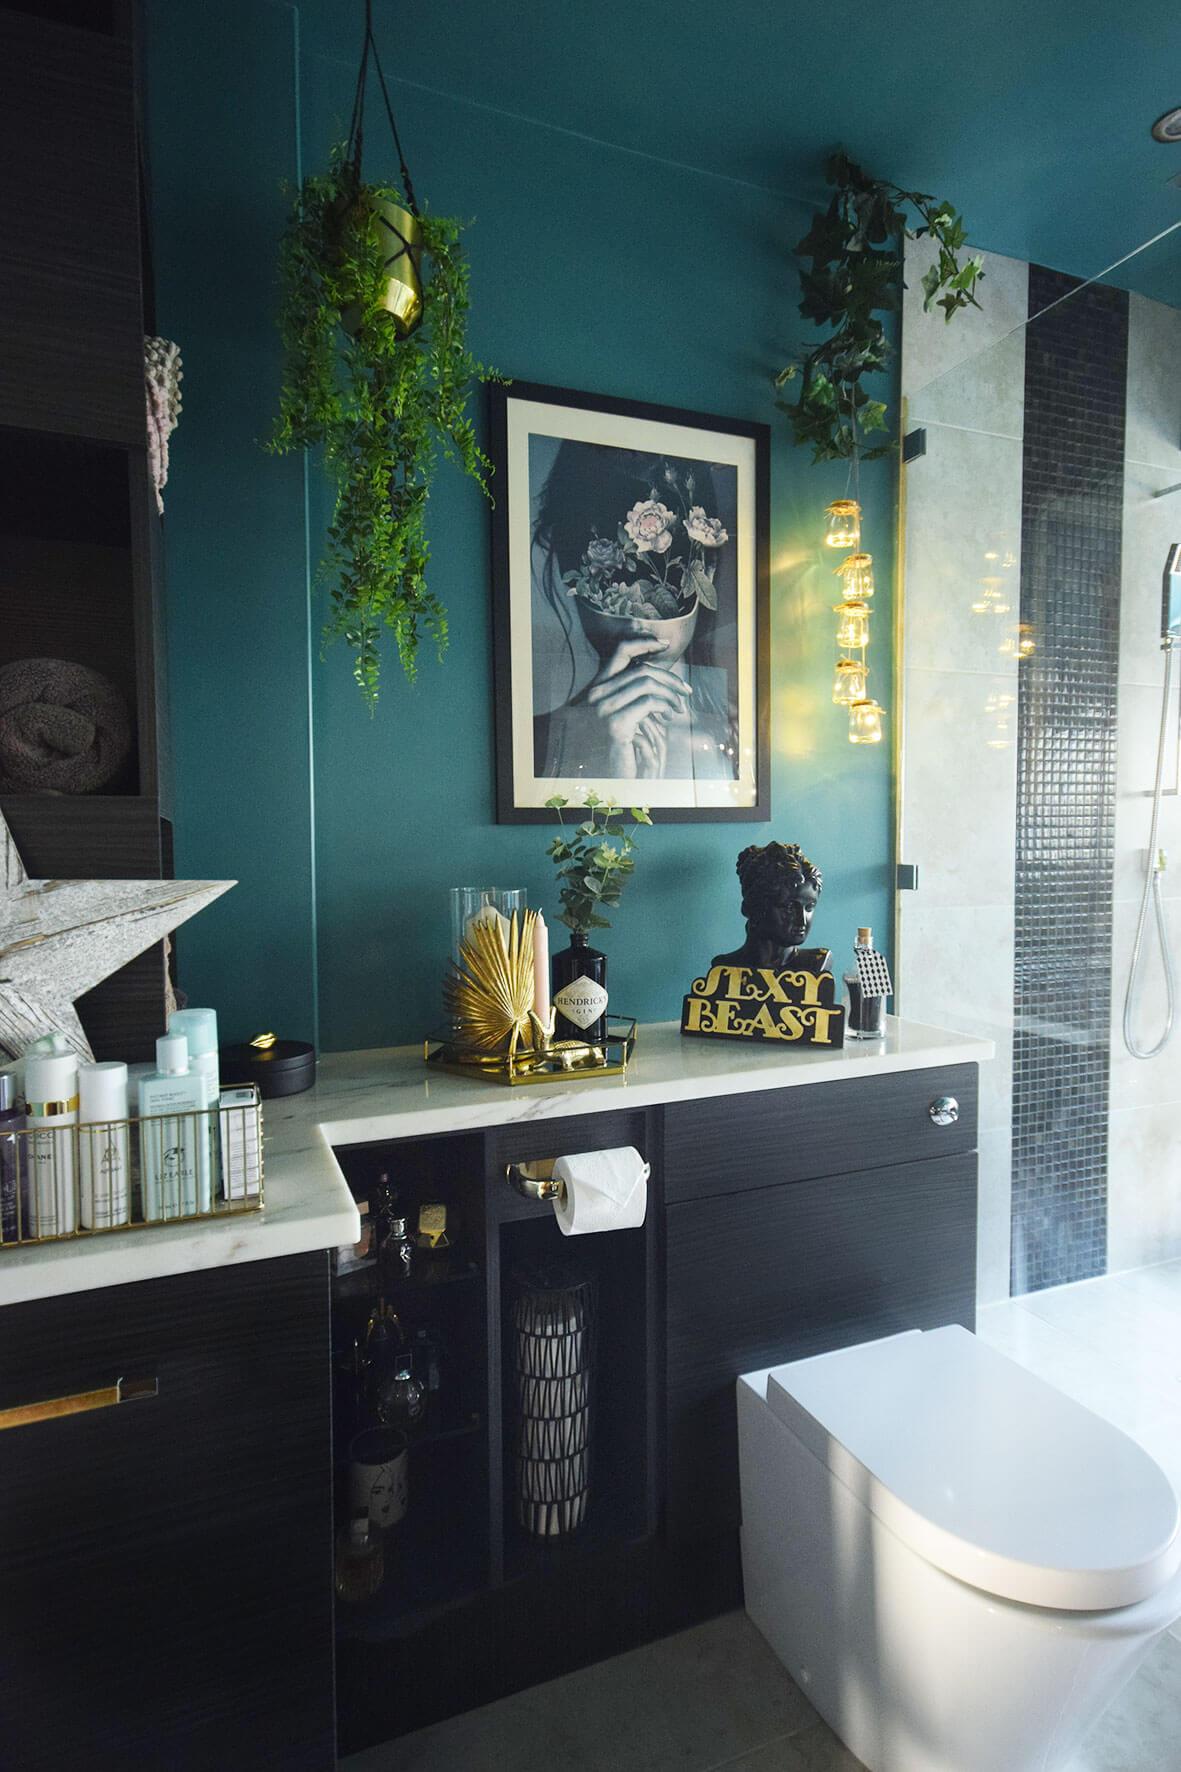 Snyggt kricka badrum